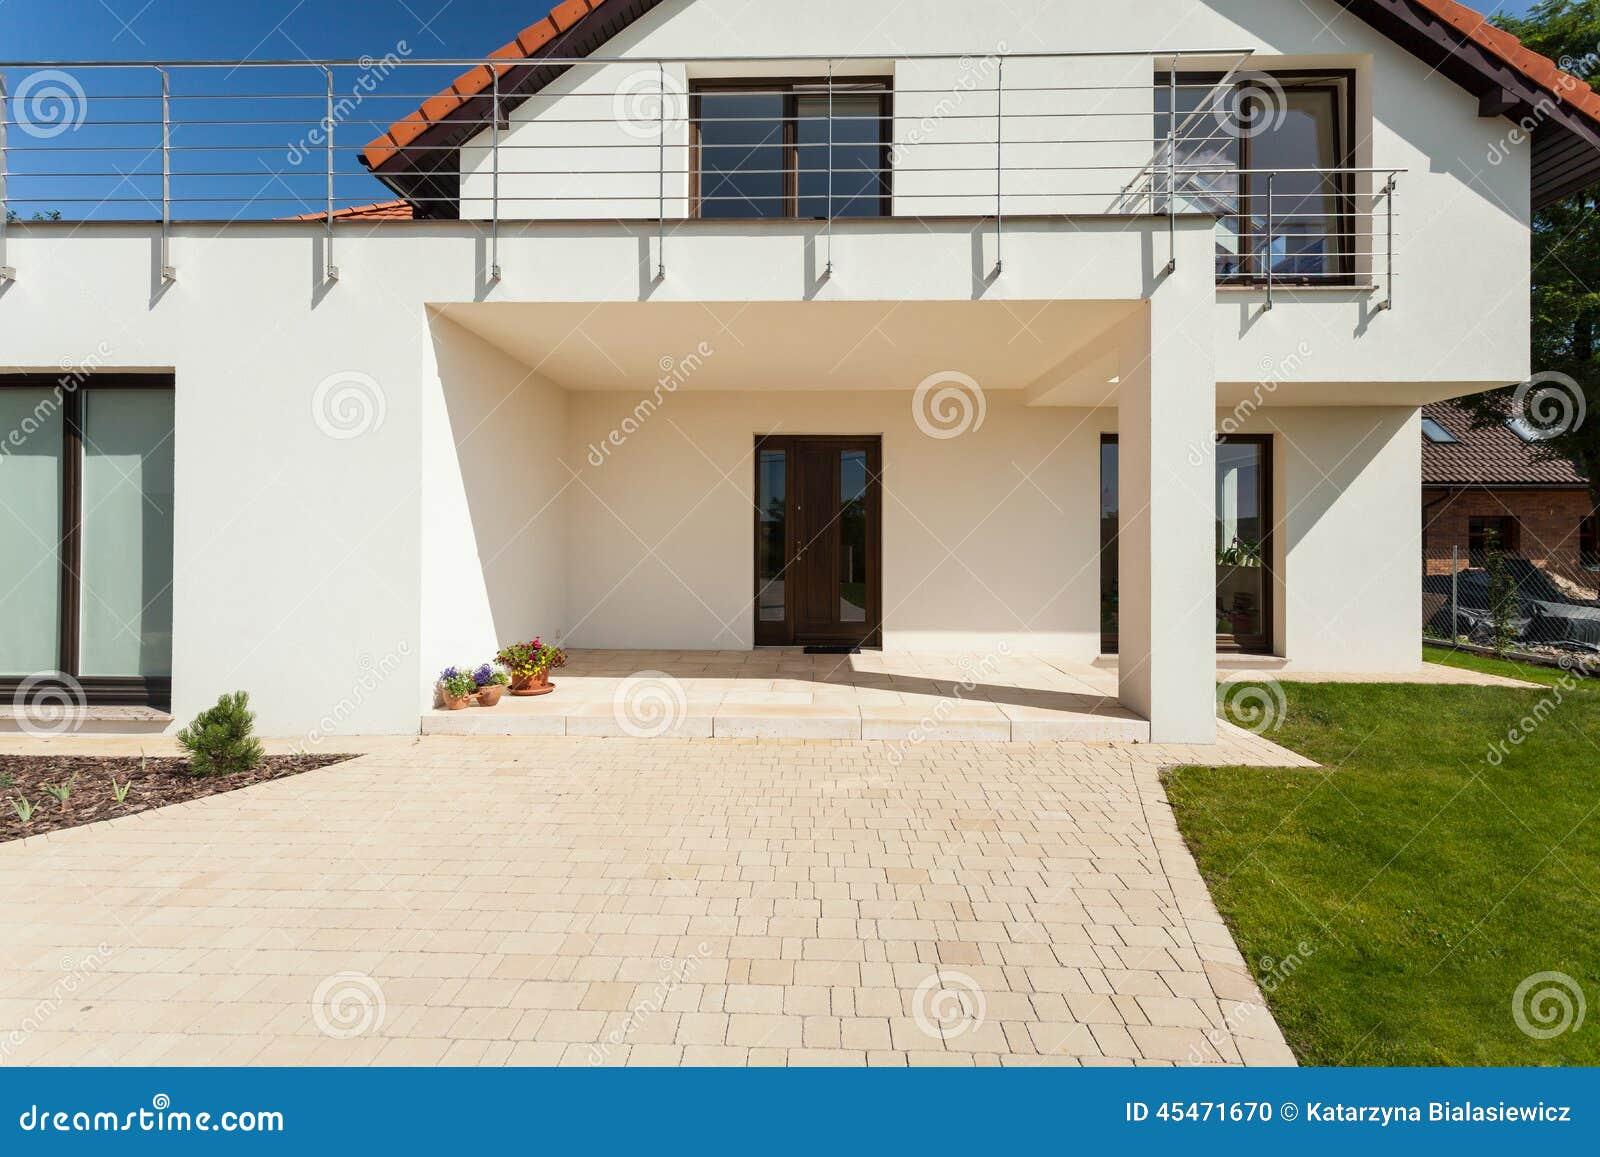 Entrada a la casa moderna foto de archivo imagen 45471670 - Entradas casas modernas ...